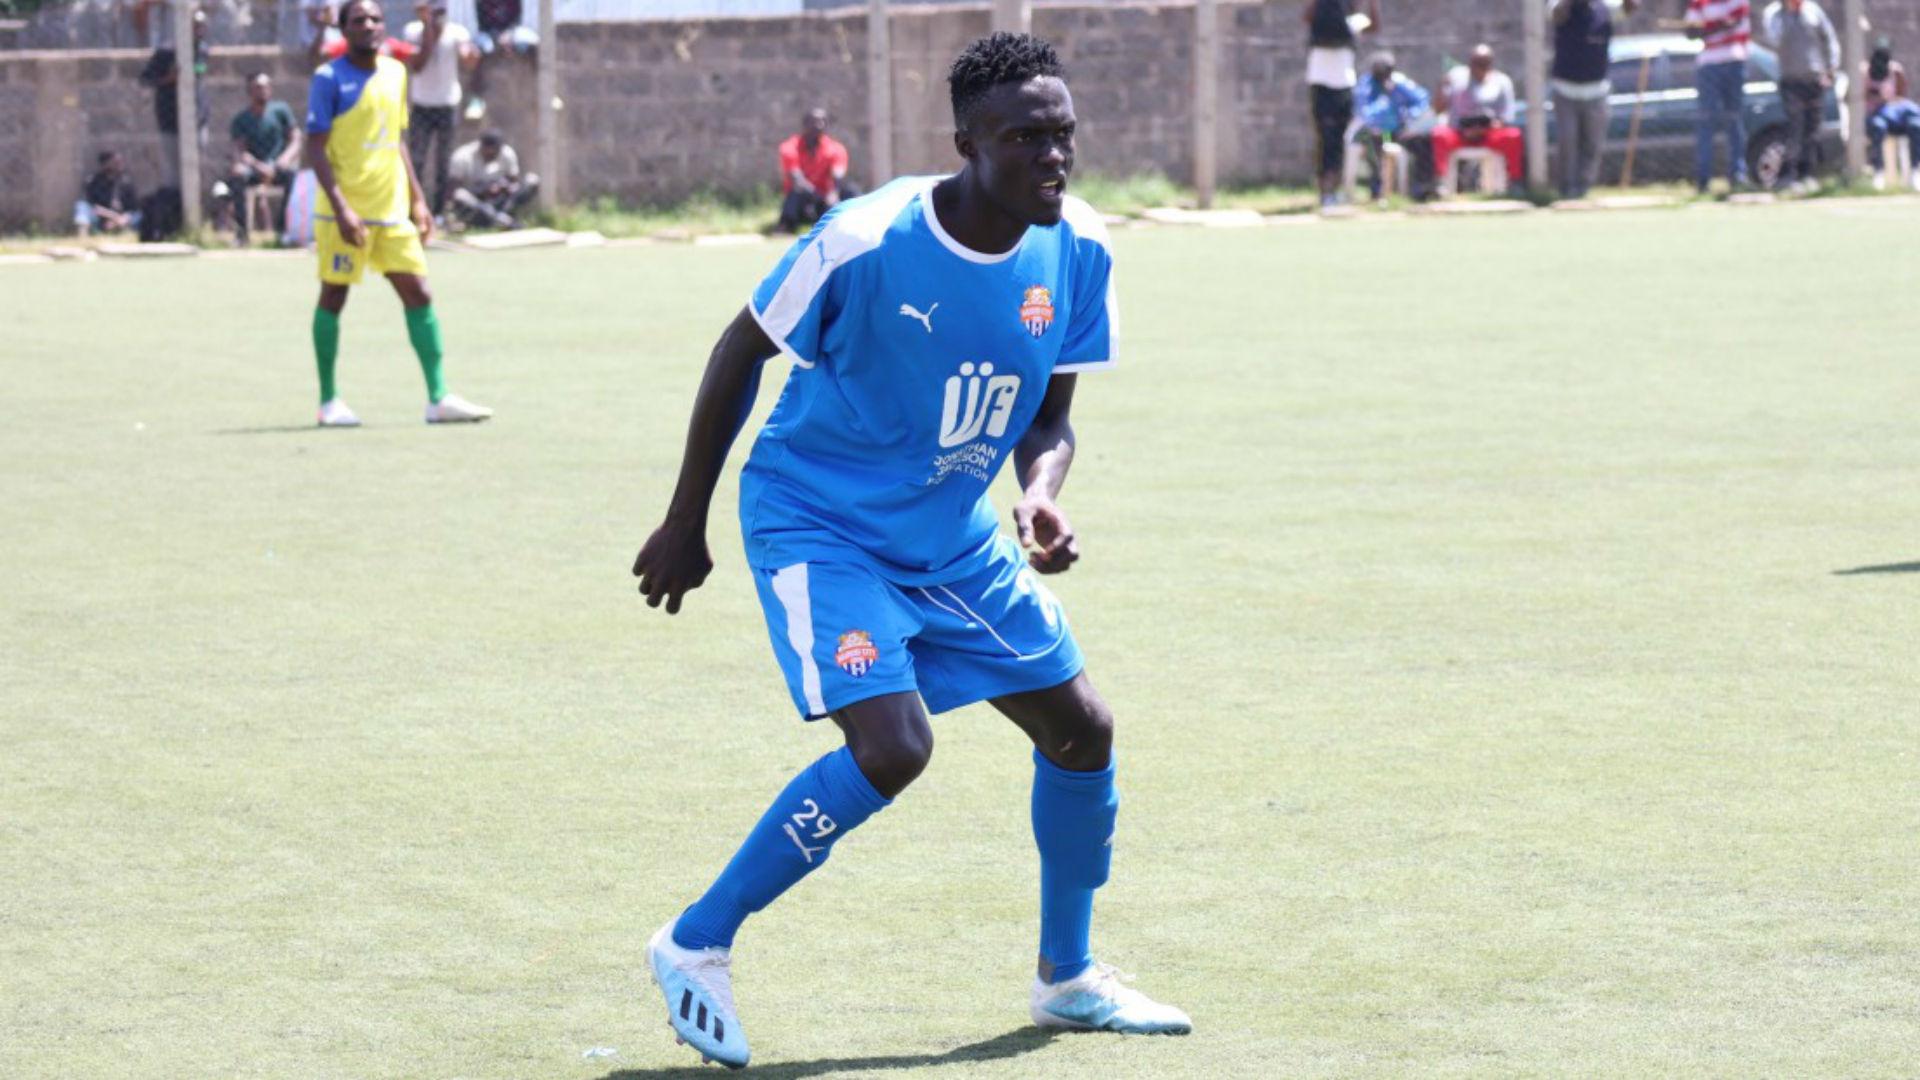 FKF PL: Nairobi City Stars to open journey against Nzoia Sugar